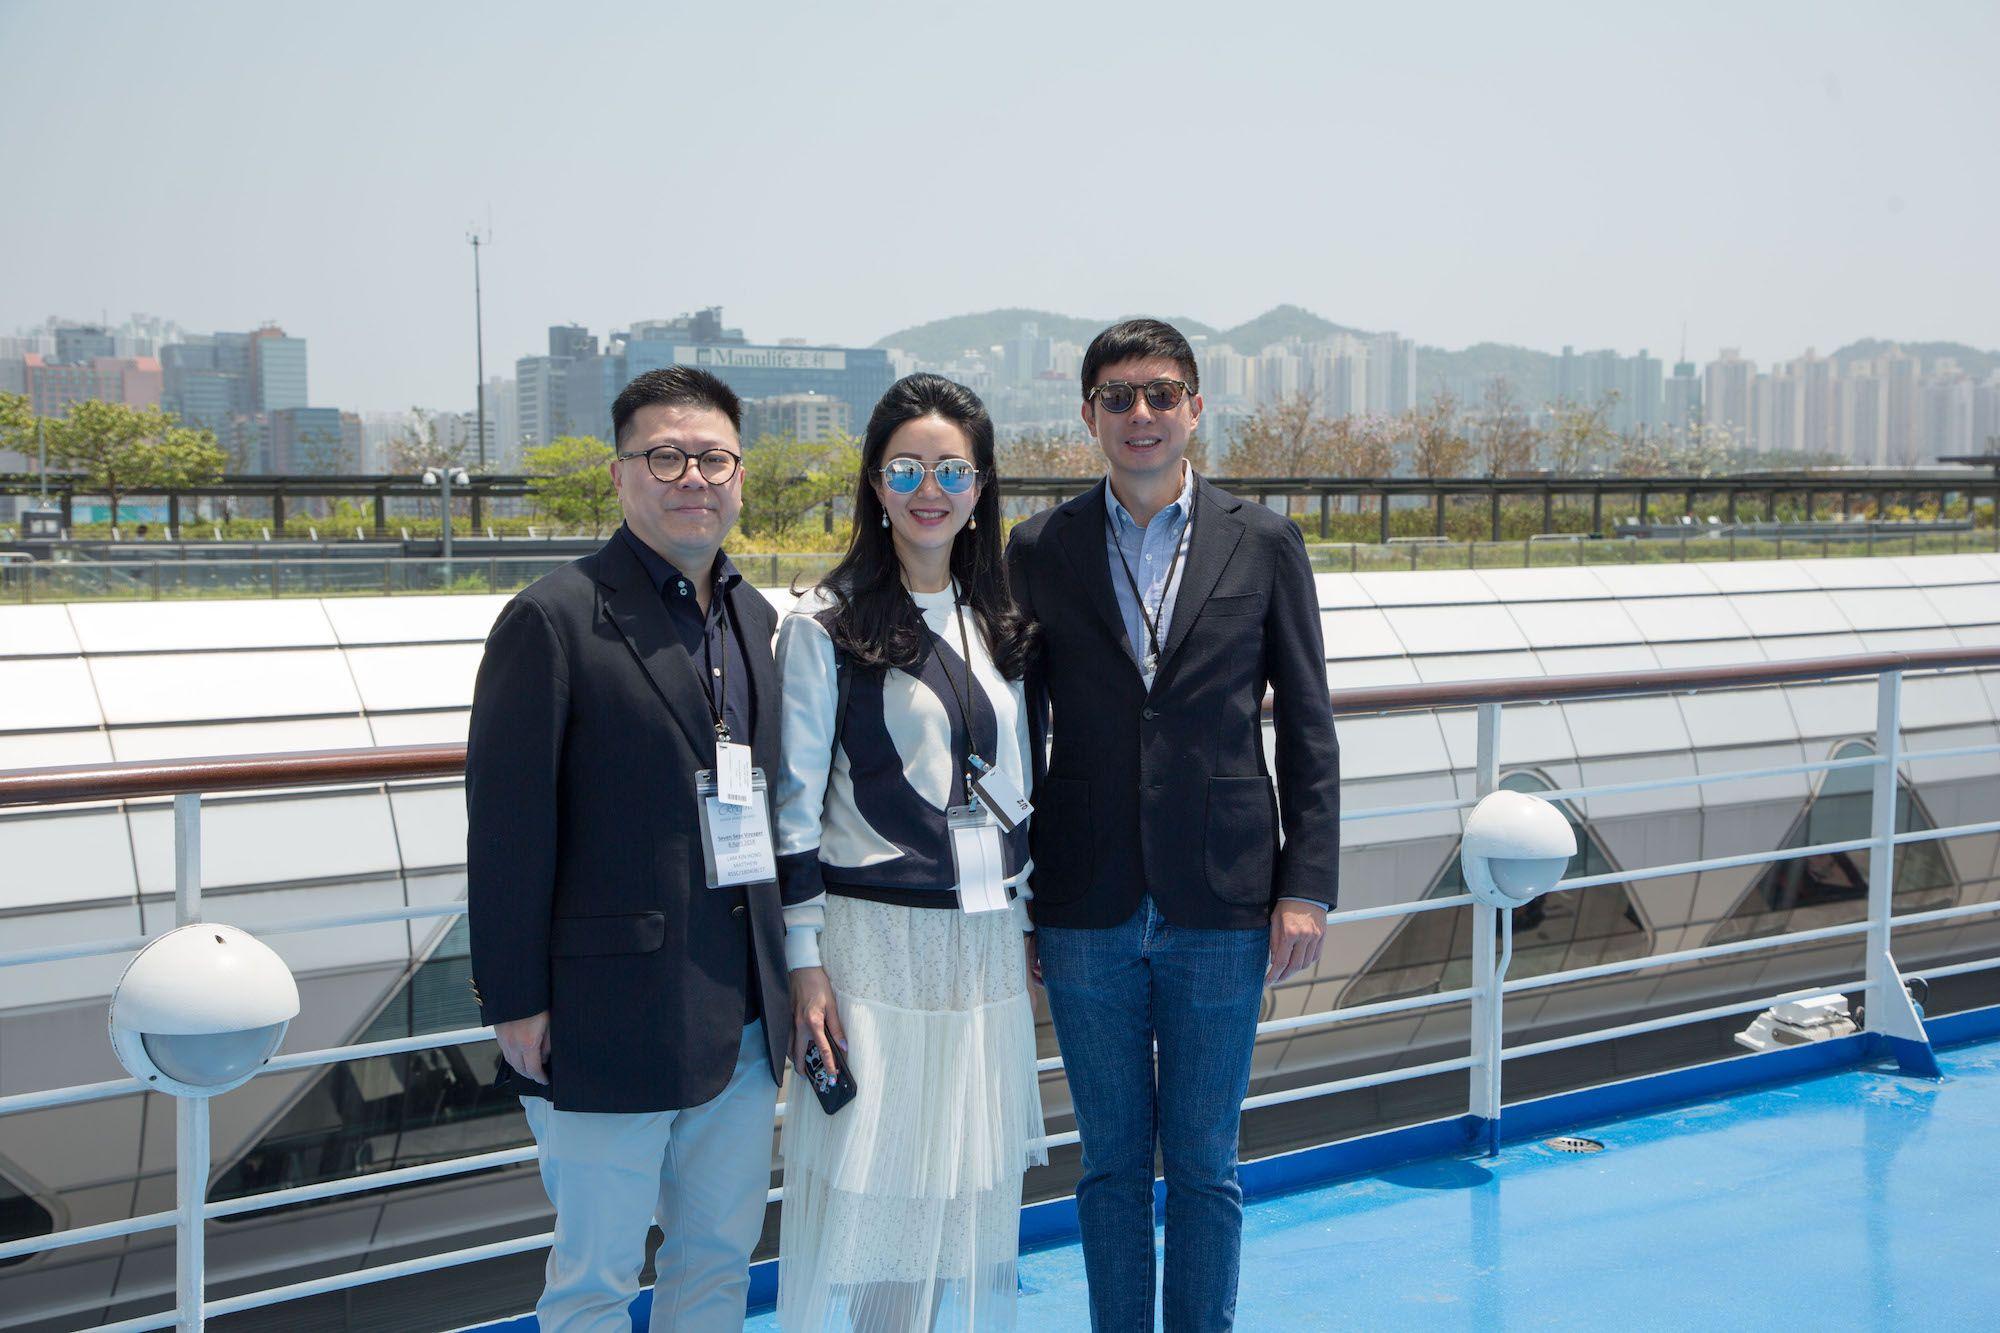 Matthew Lam, Lianne Lam, Philip Ma